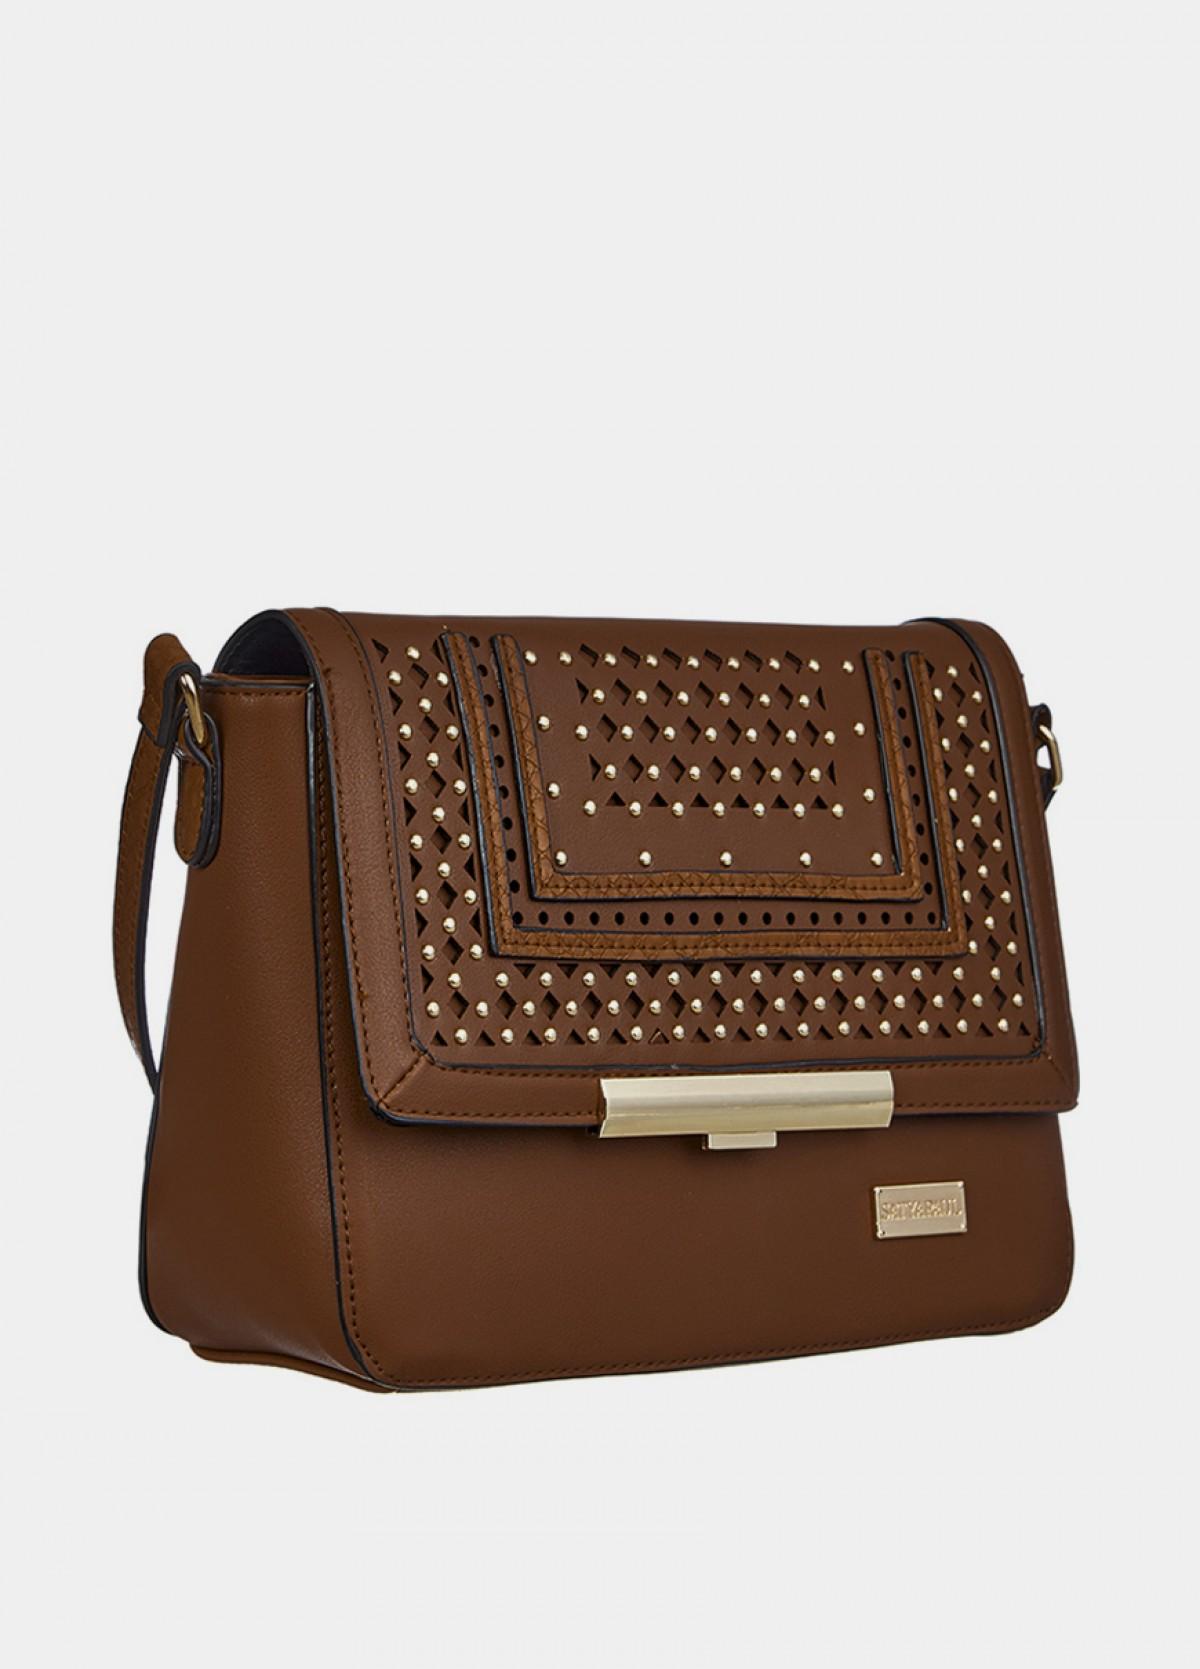 The Brown Sling Bag